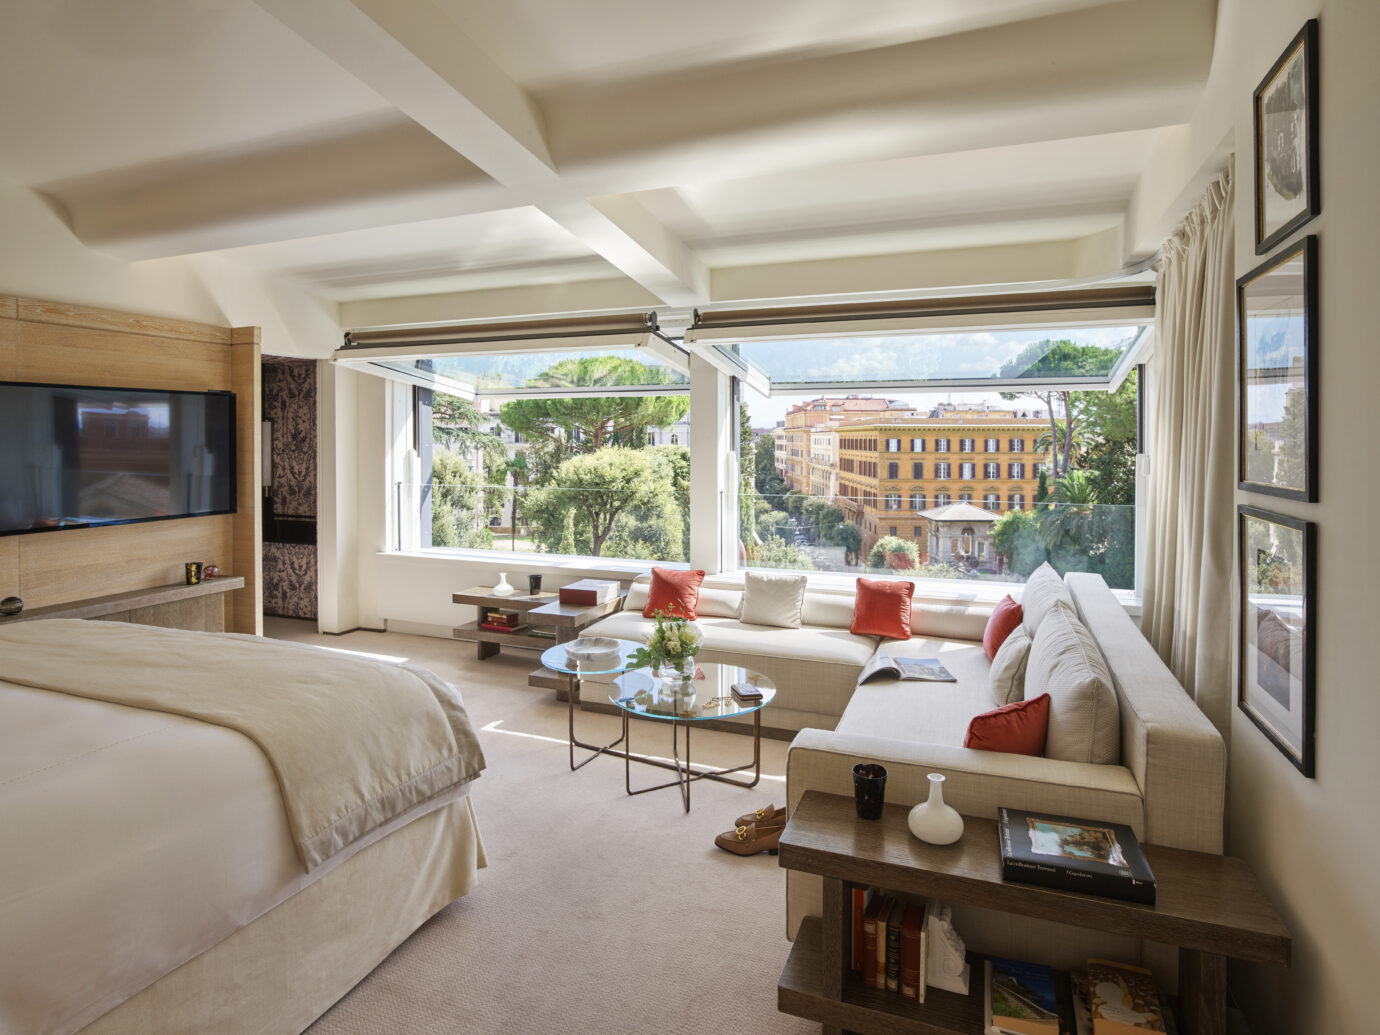 Hotel Eden Roma - Bellavista Penthouse Suite bedroom new